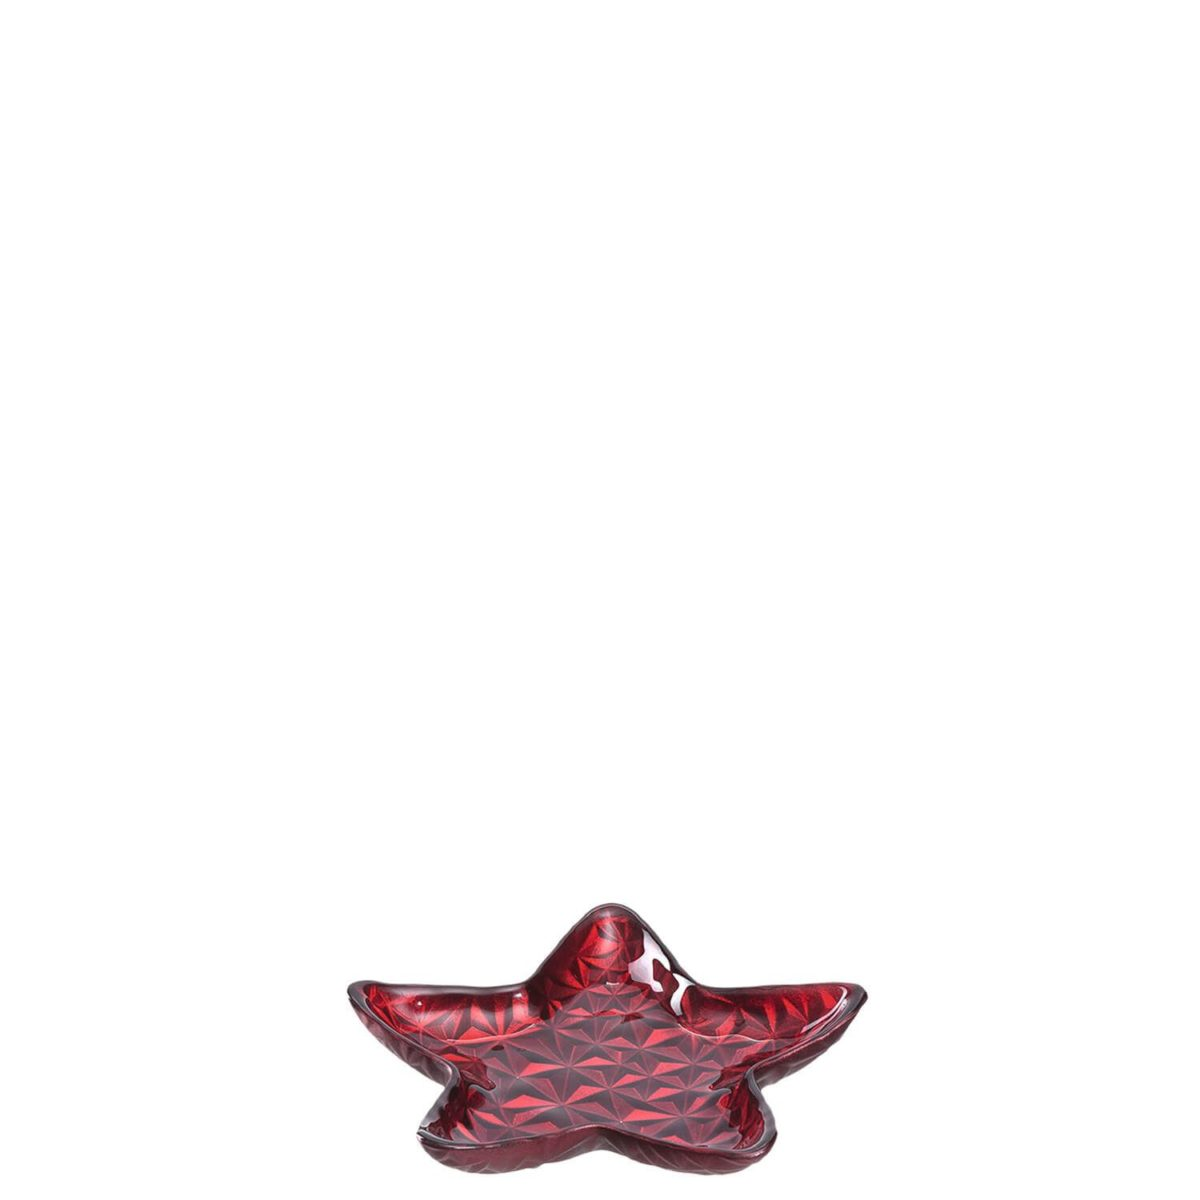 041332 0 k 1200x1200 - Platou Decora red LEONARDO (L041332)